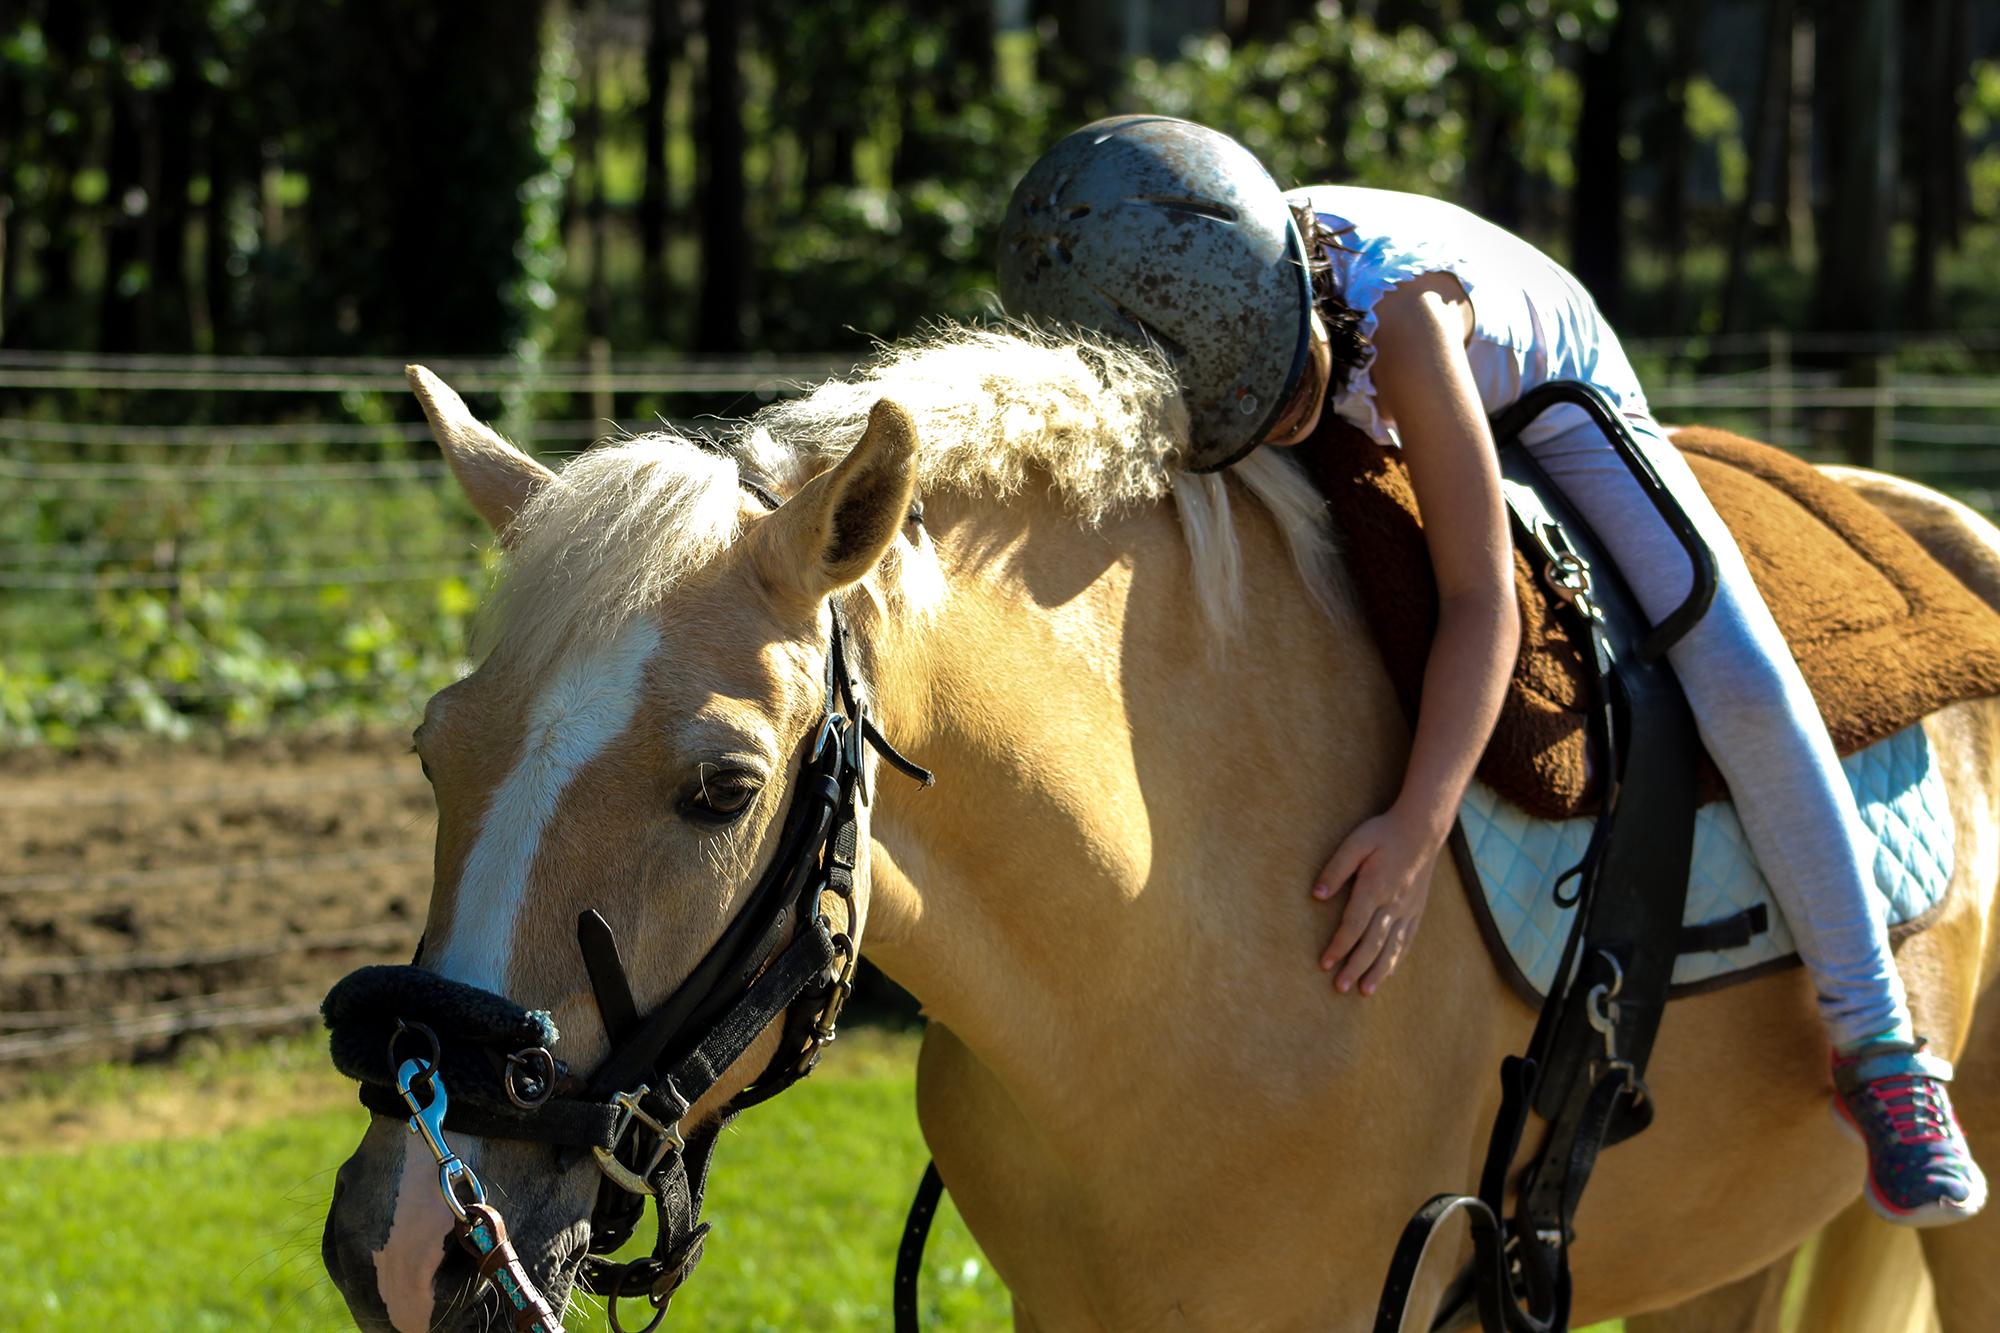 Child hugging horse